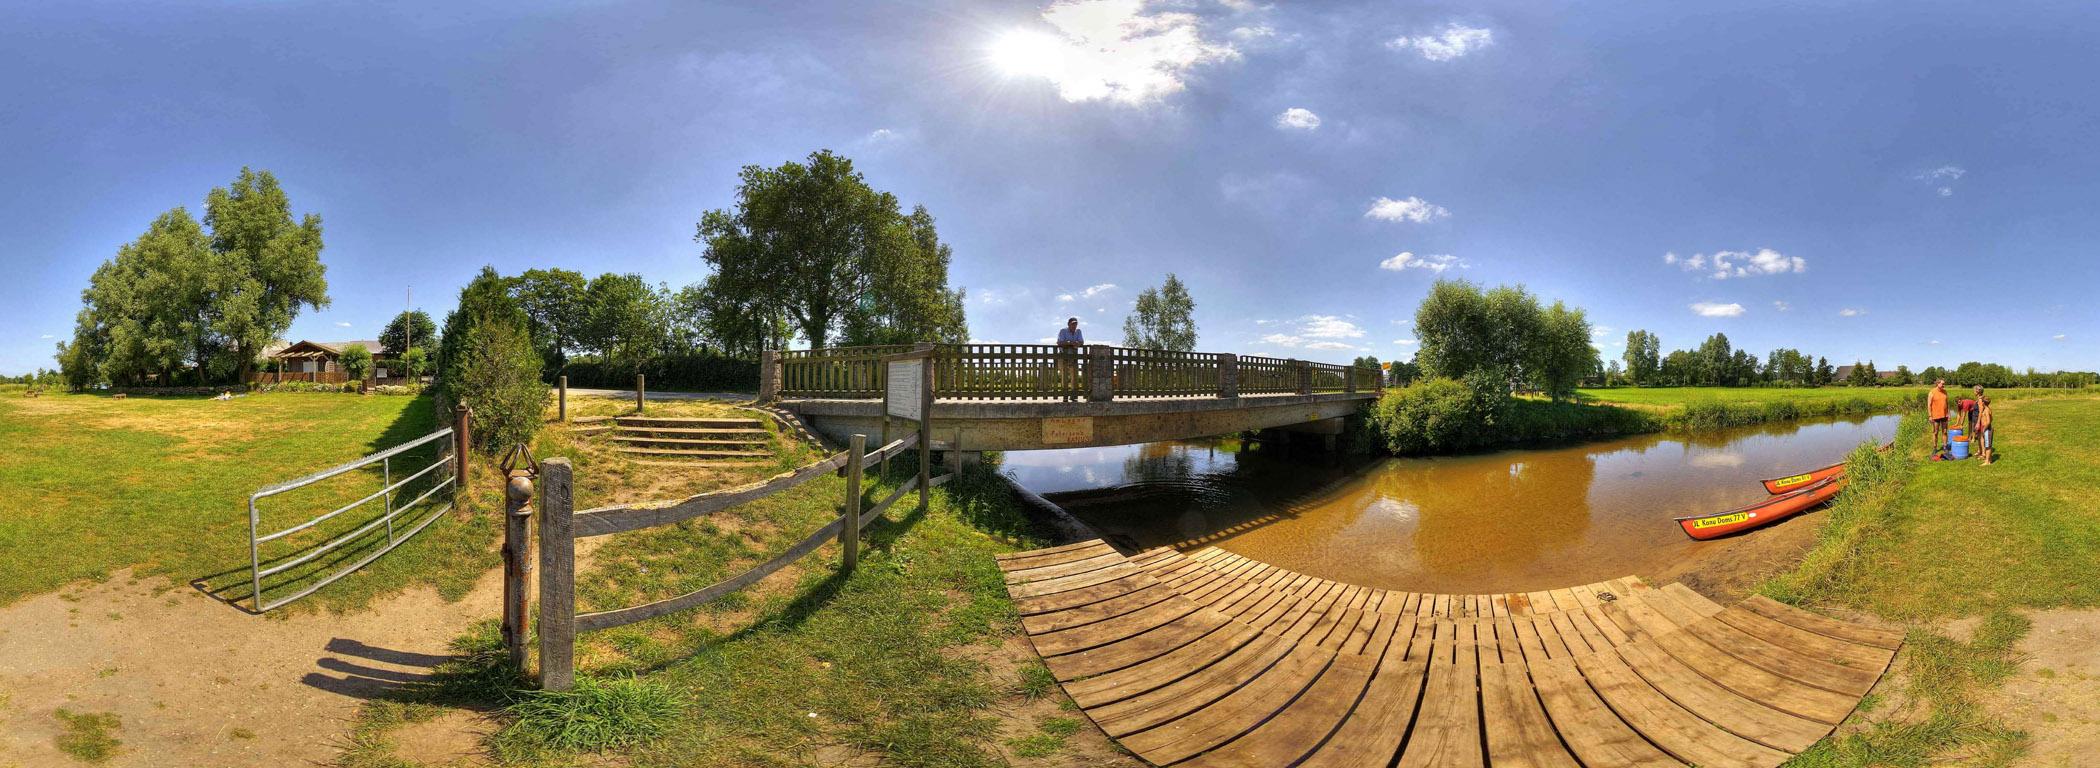 les-canoes-photographie-panoramique